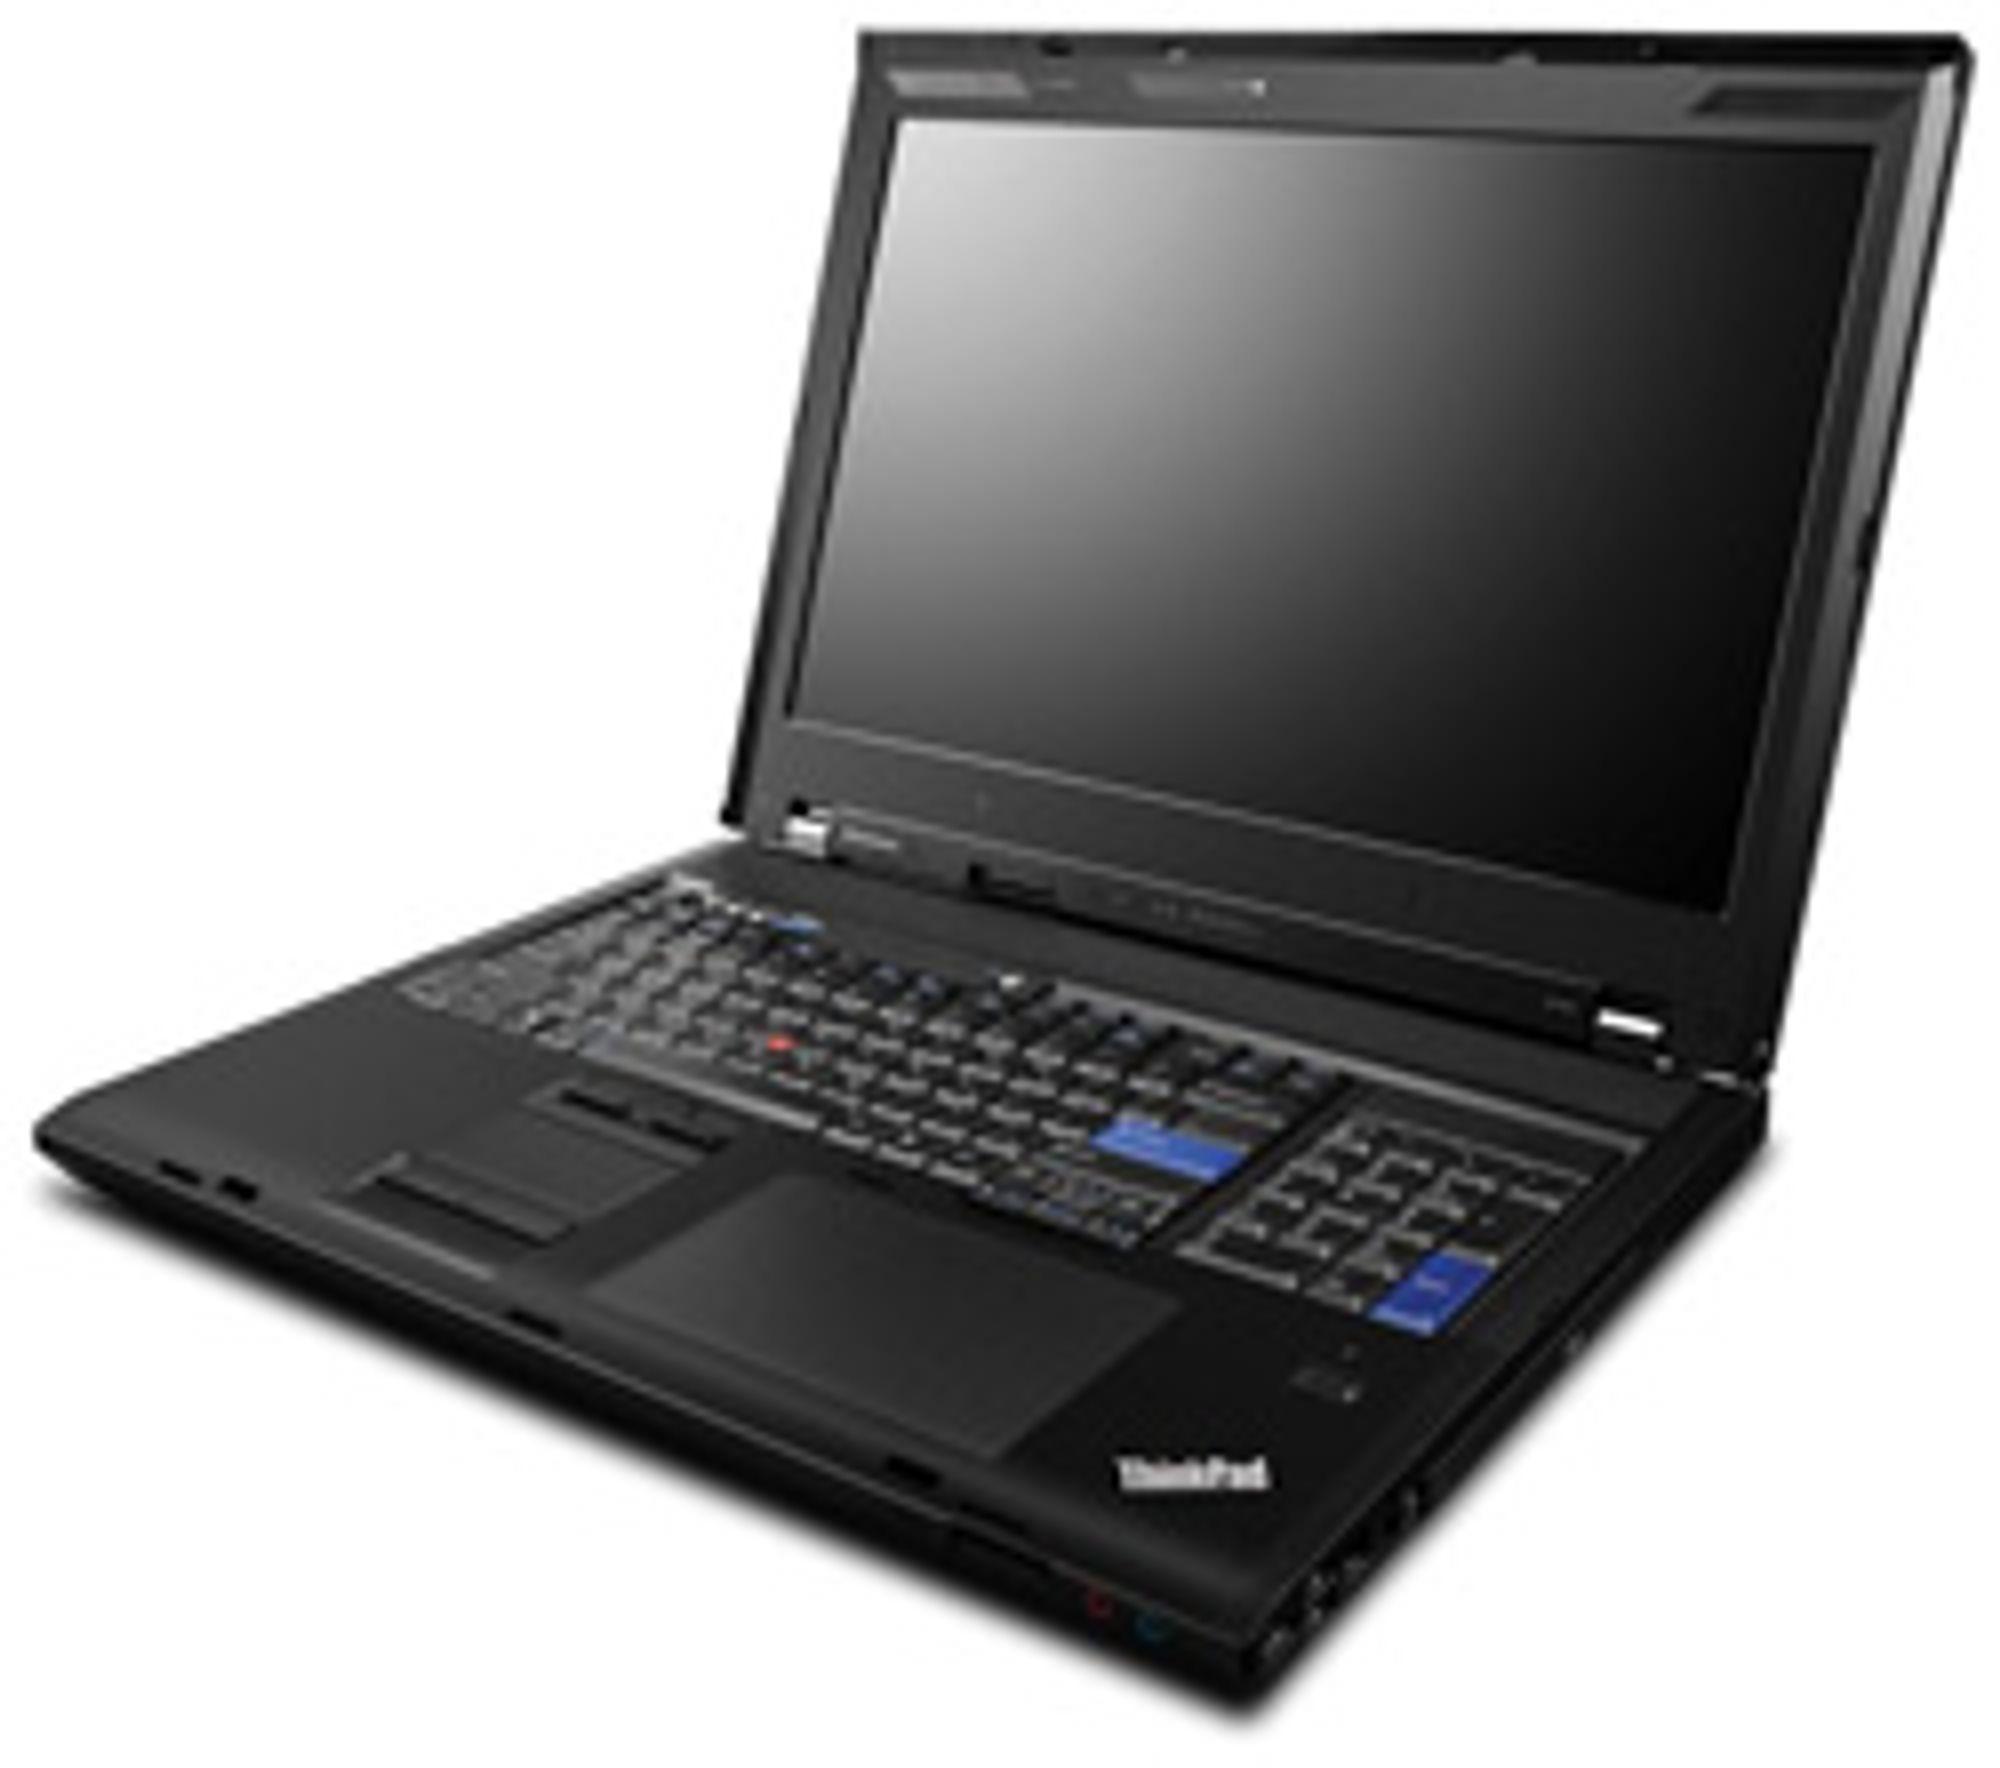 Lenovos Thinkpad W700 har to tastesett. (Foto: Lenovo)